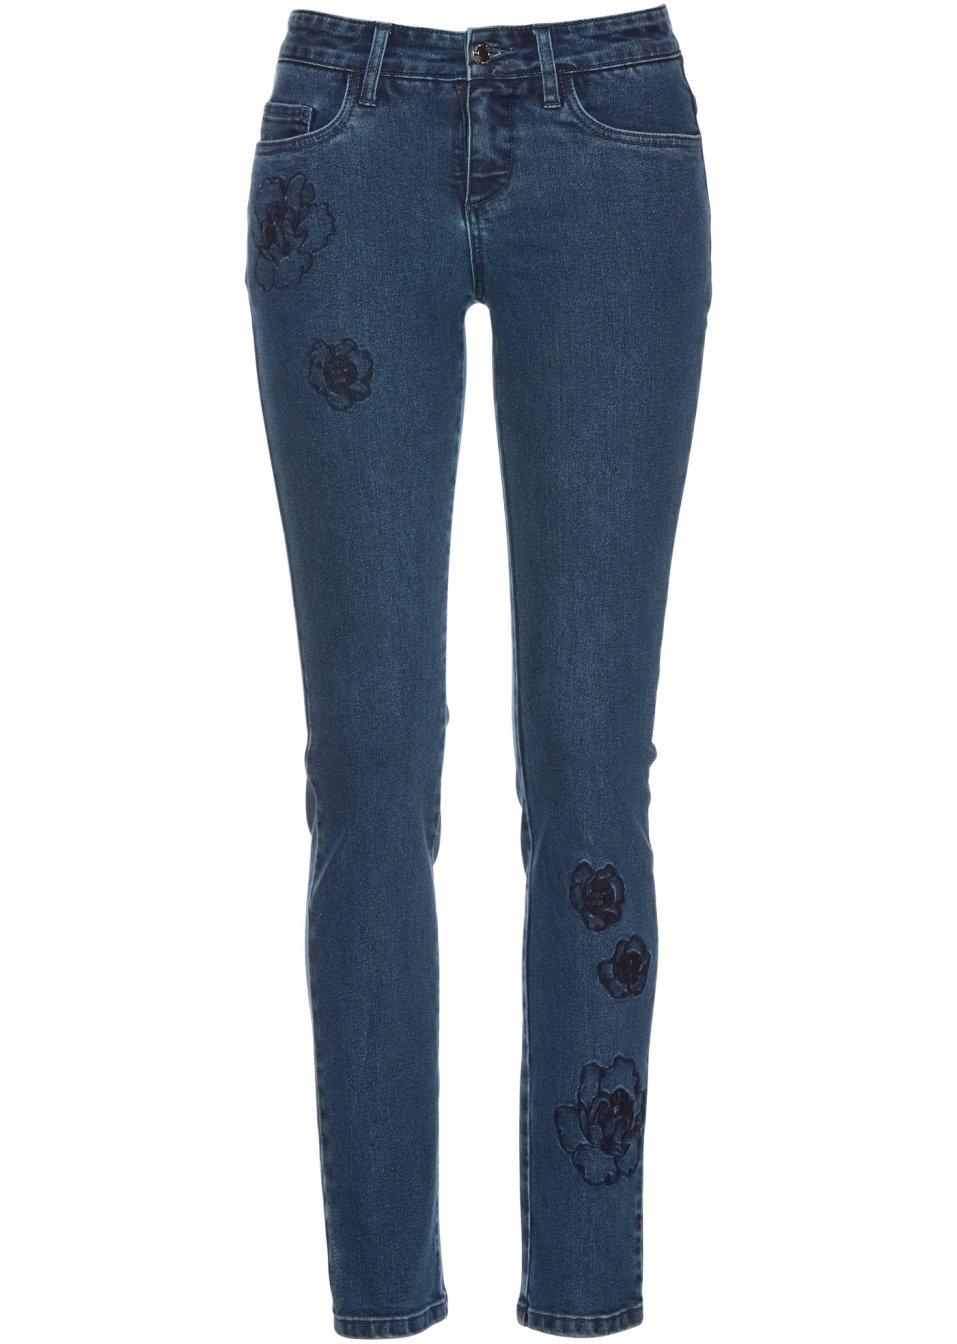 jean avec broderie bleu stone femme bpc selection premium. Black Bedroom Furniture Sets. Home Design Ideas